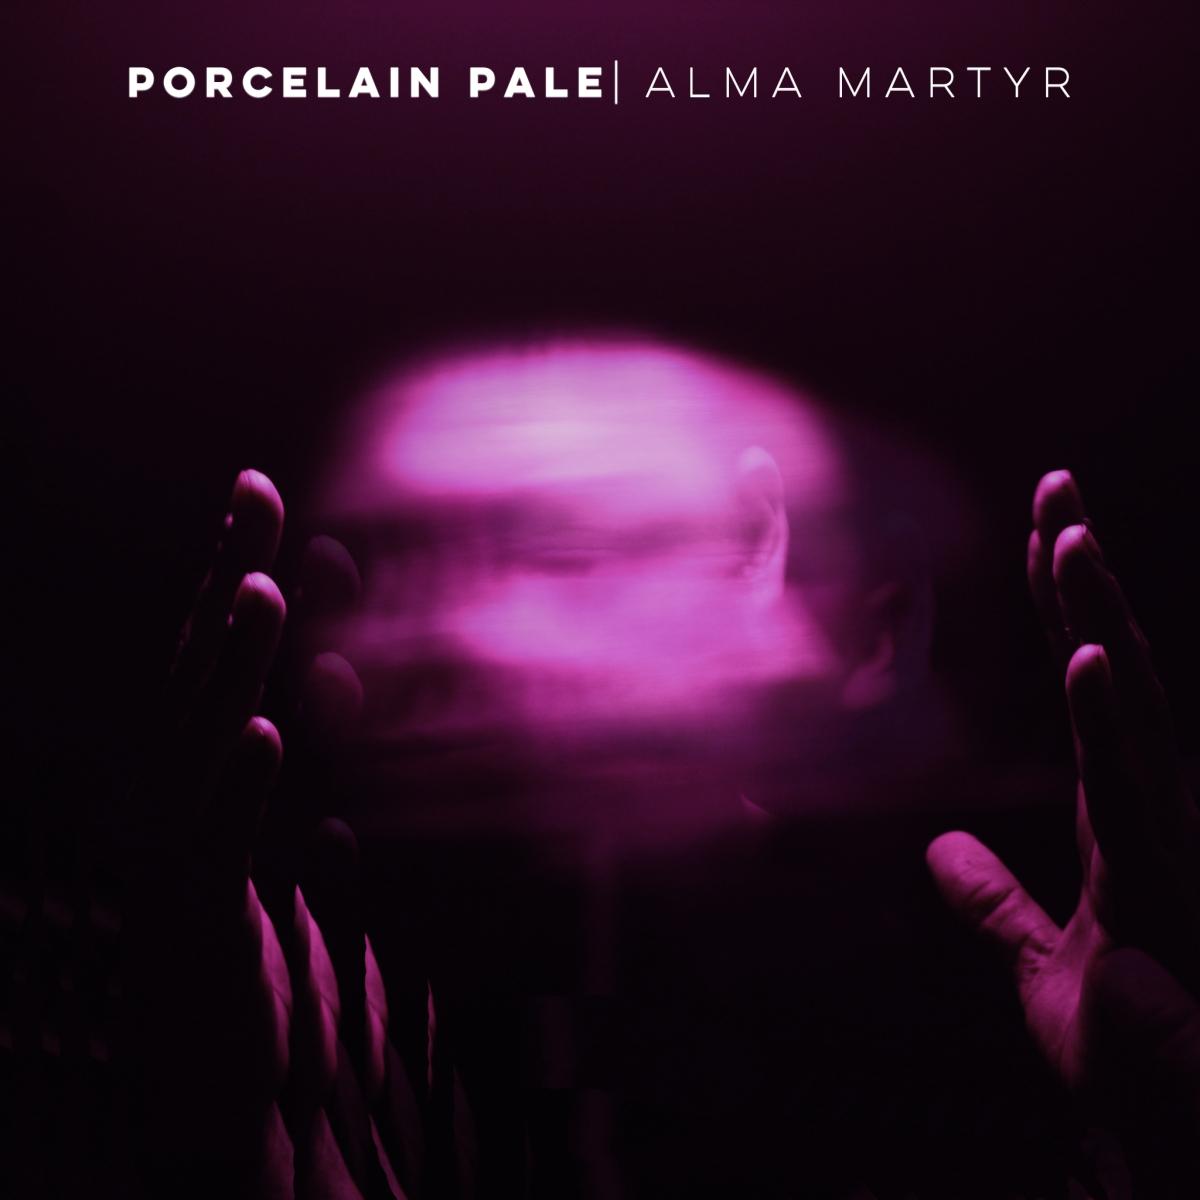 Porcelain Pale 'Alma Martyr'